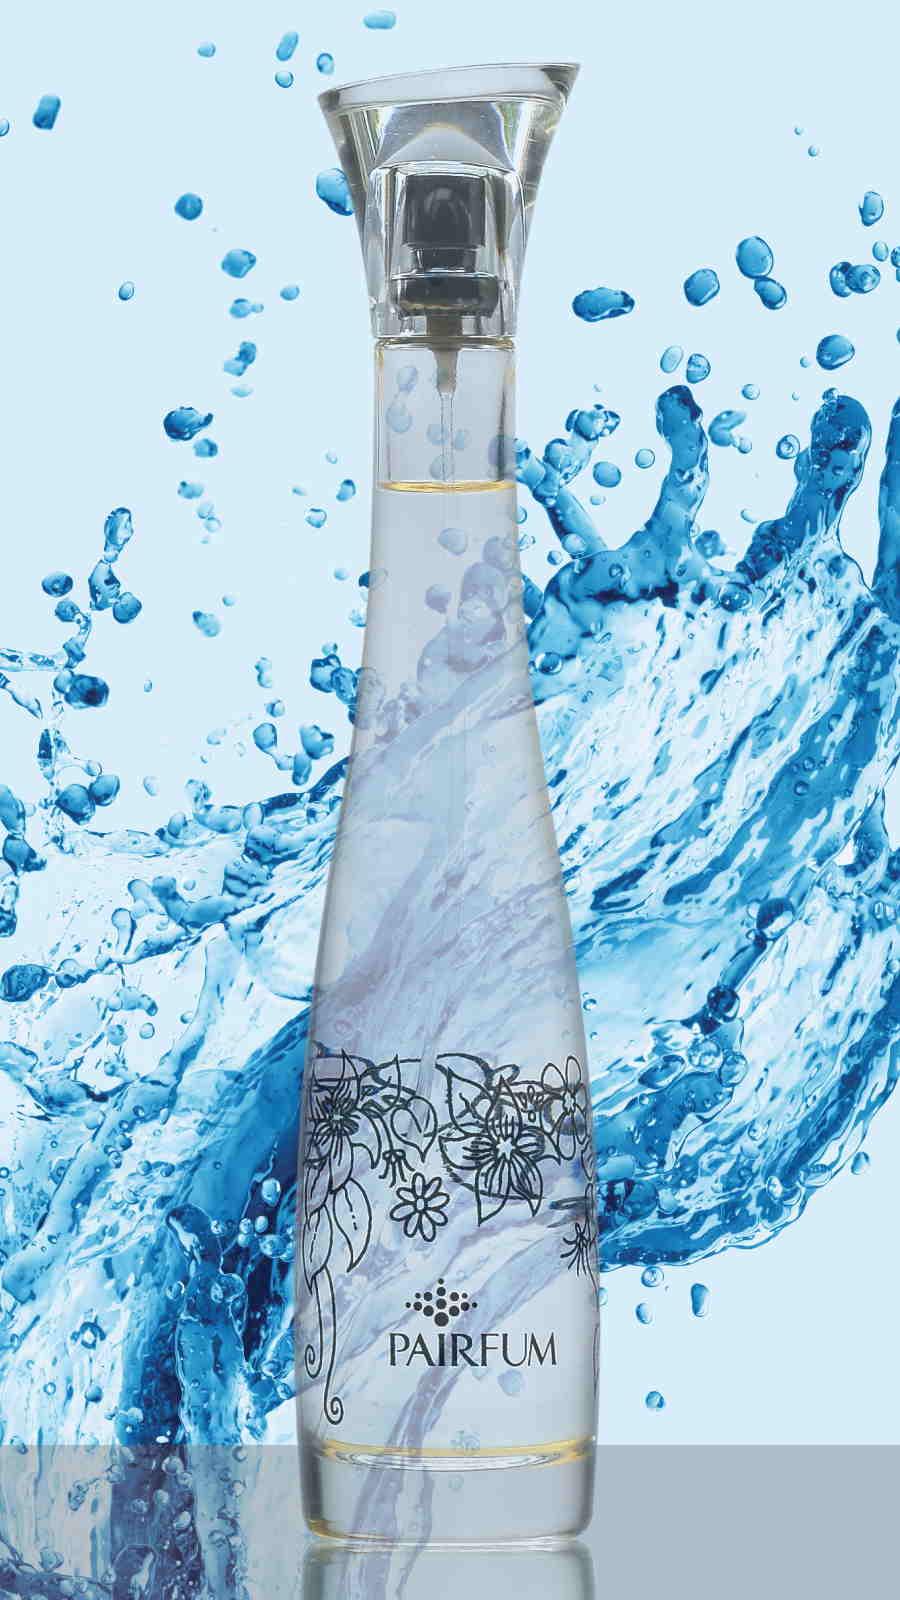 Flacon Room Perfume Spray Aqua Spa 9 16